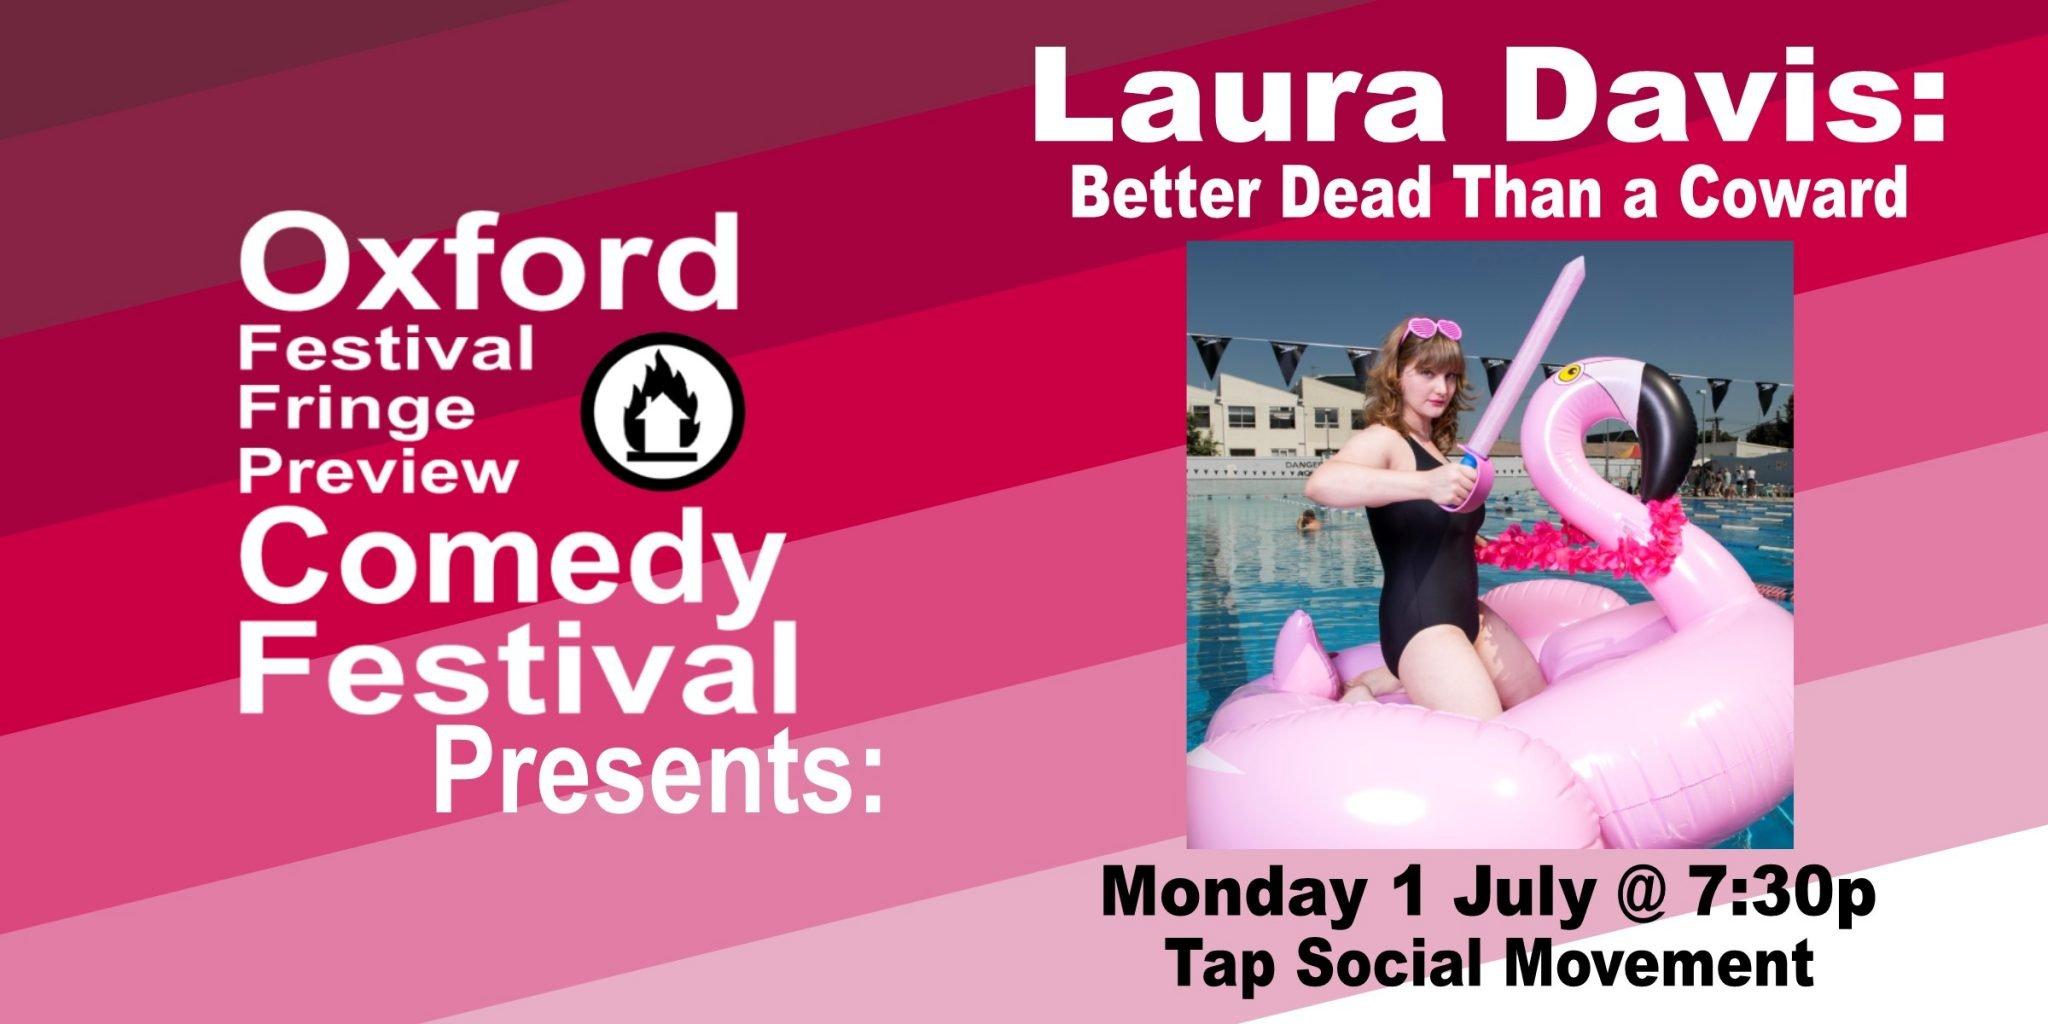 Oxford Comedy Festival 2019 presents Laura Davis: Better Dead Than a Coward